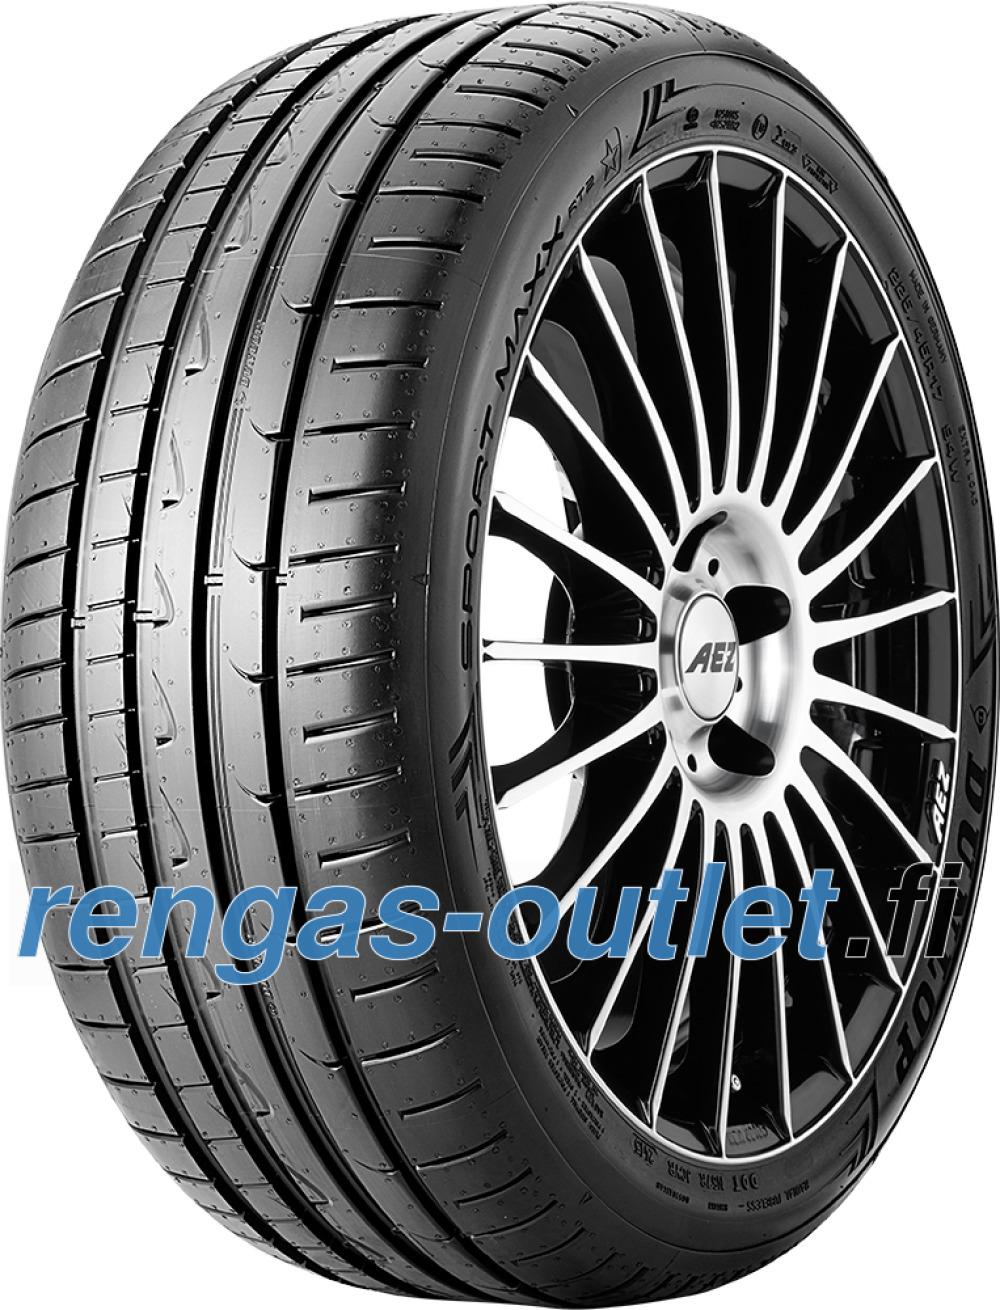 Dunlop Sport Maxx RT2 ( 205/45 R17 88Y XL vannesuojalla (MFS) )